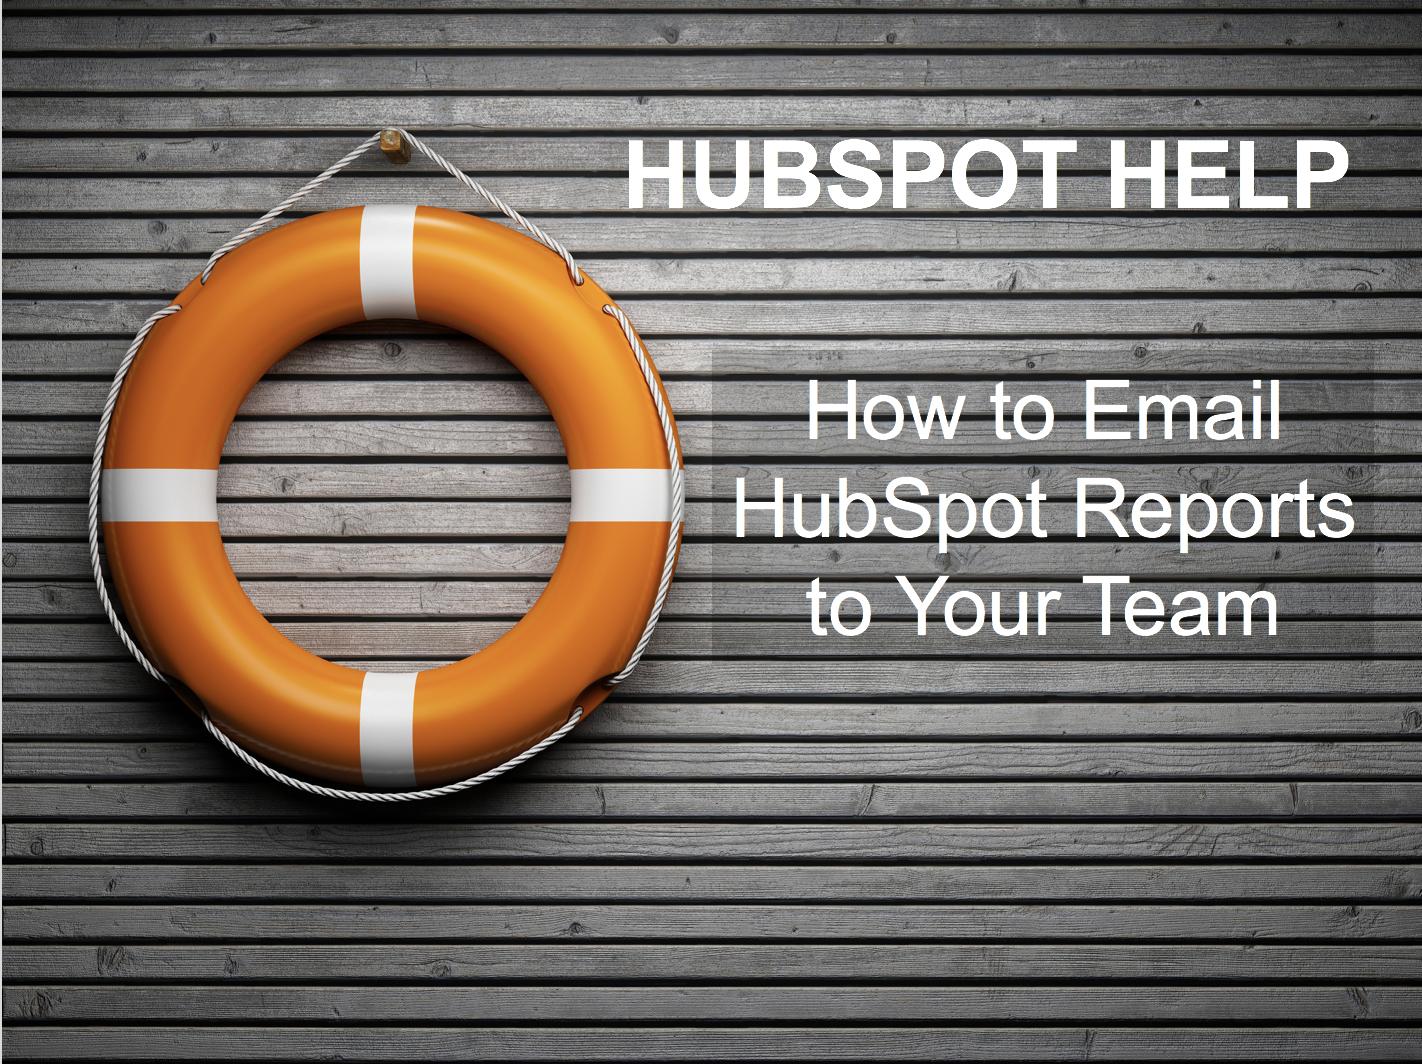 HubSpot Help Emailing Report